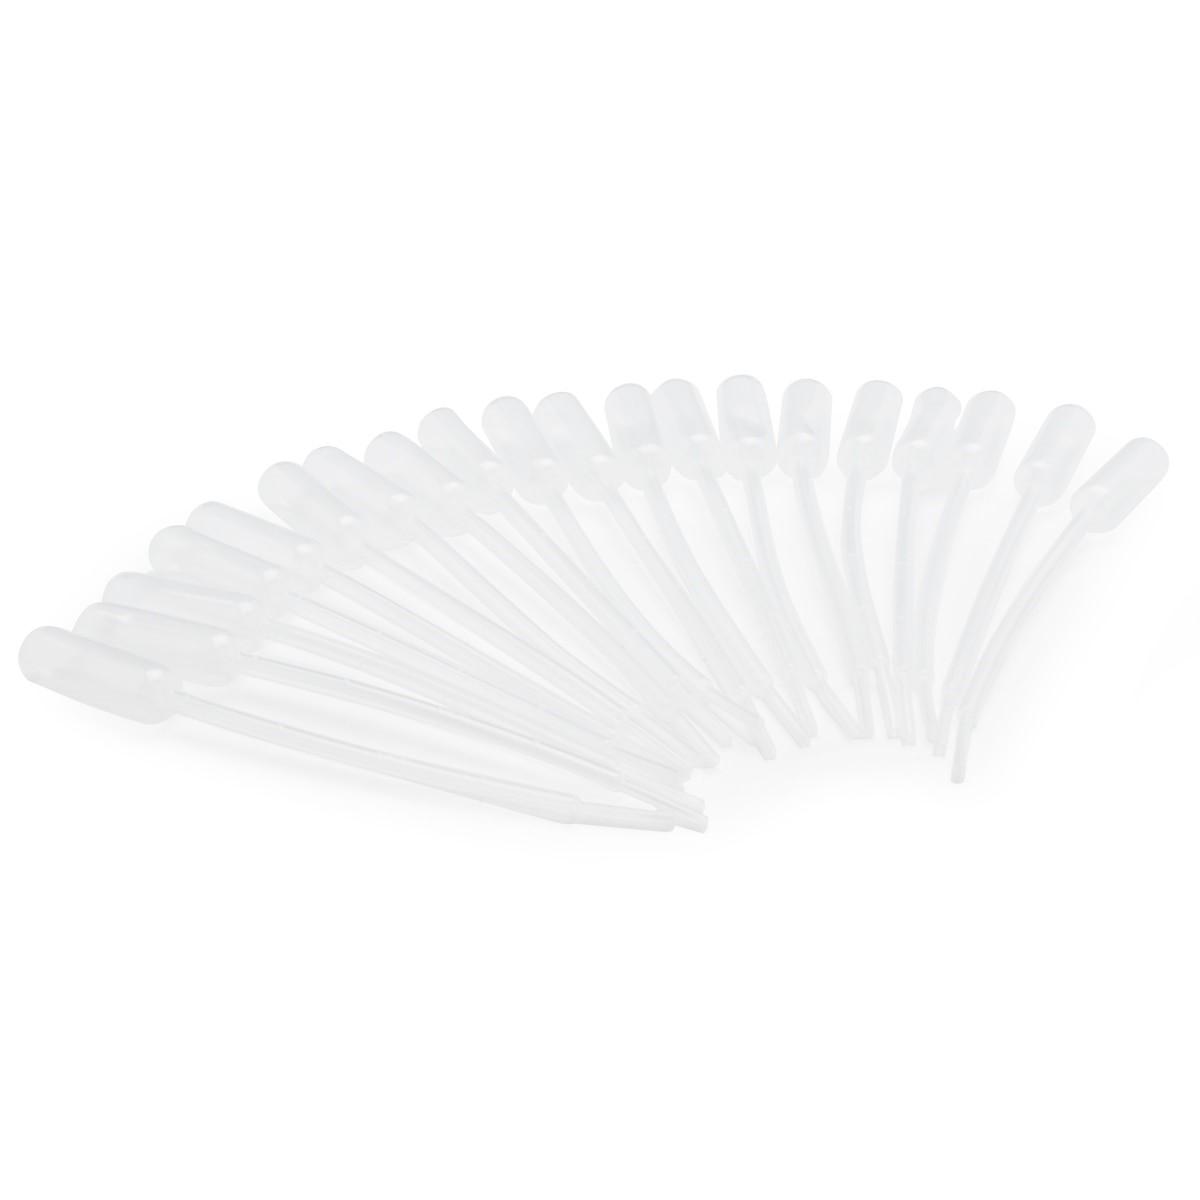 Electrode Refilling Pipettes (20 pcs.) - HI740157P